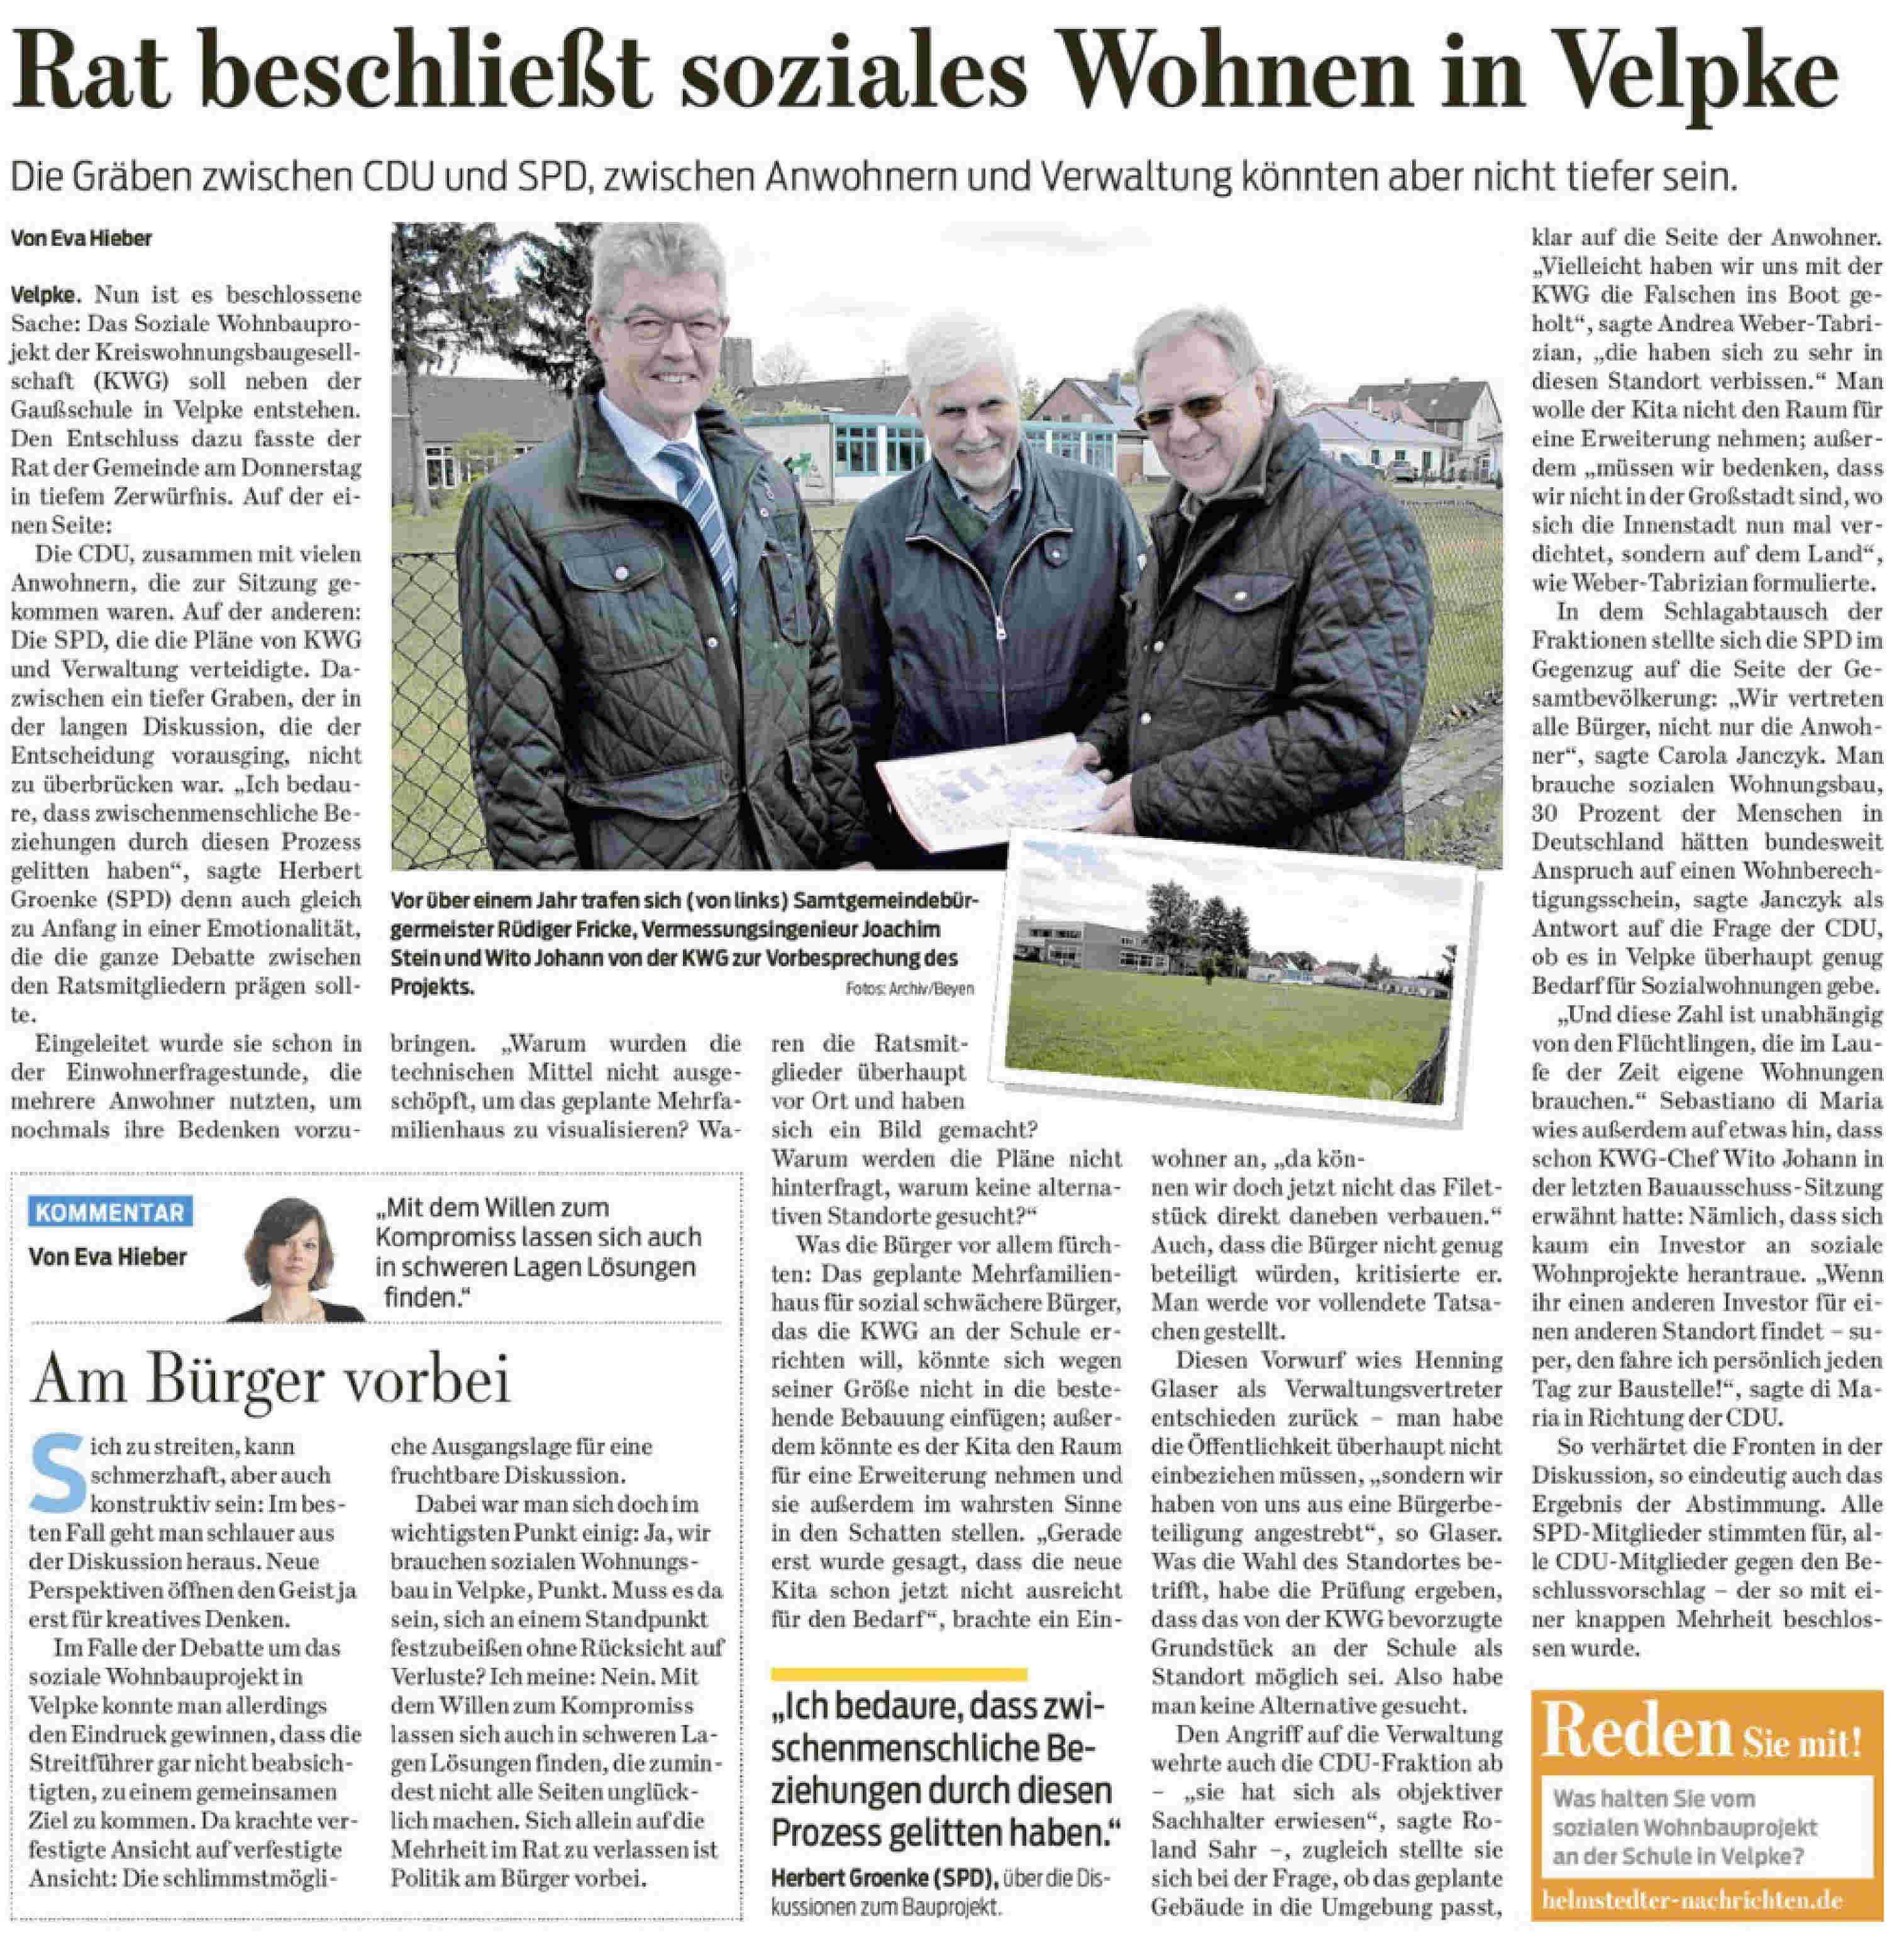 http://www.kwg-helmstedt.de/media/Velpke_Rat_beschließt_soziales_Wohnen_2018-011.jpg